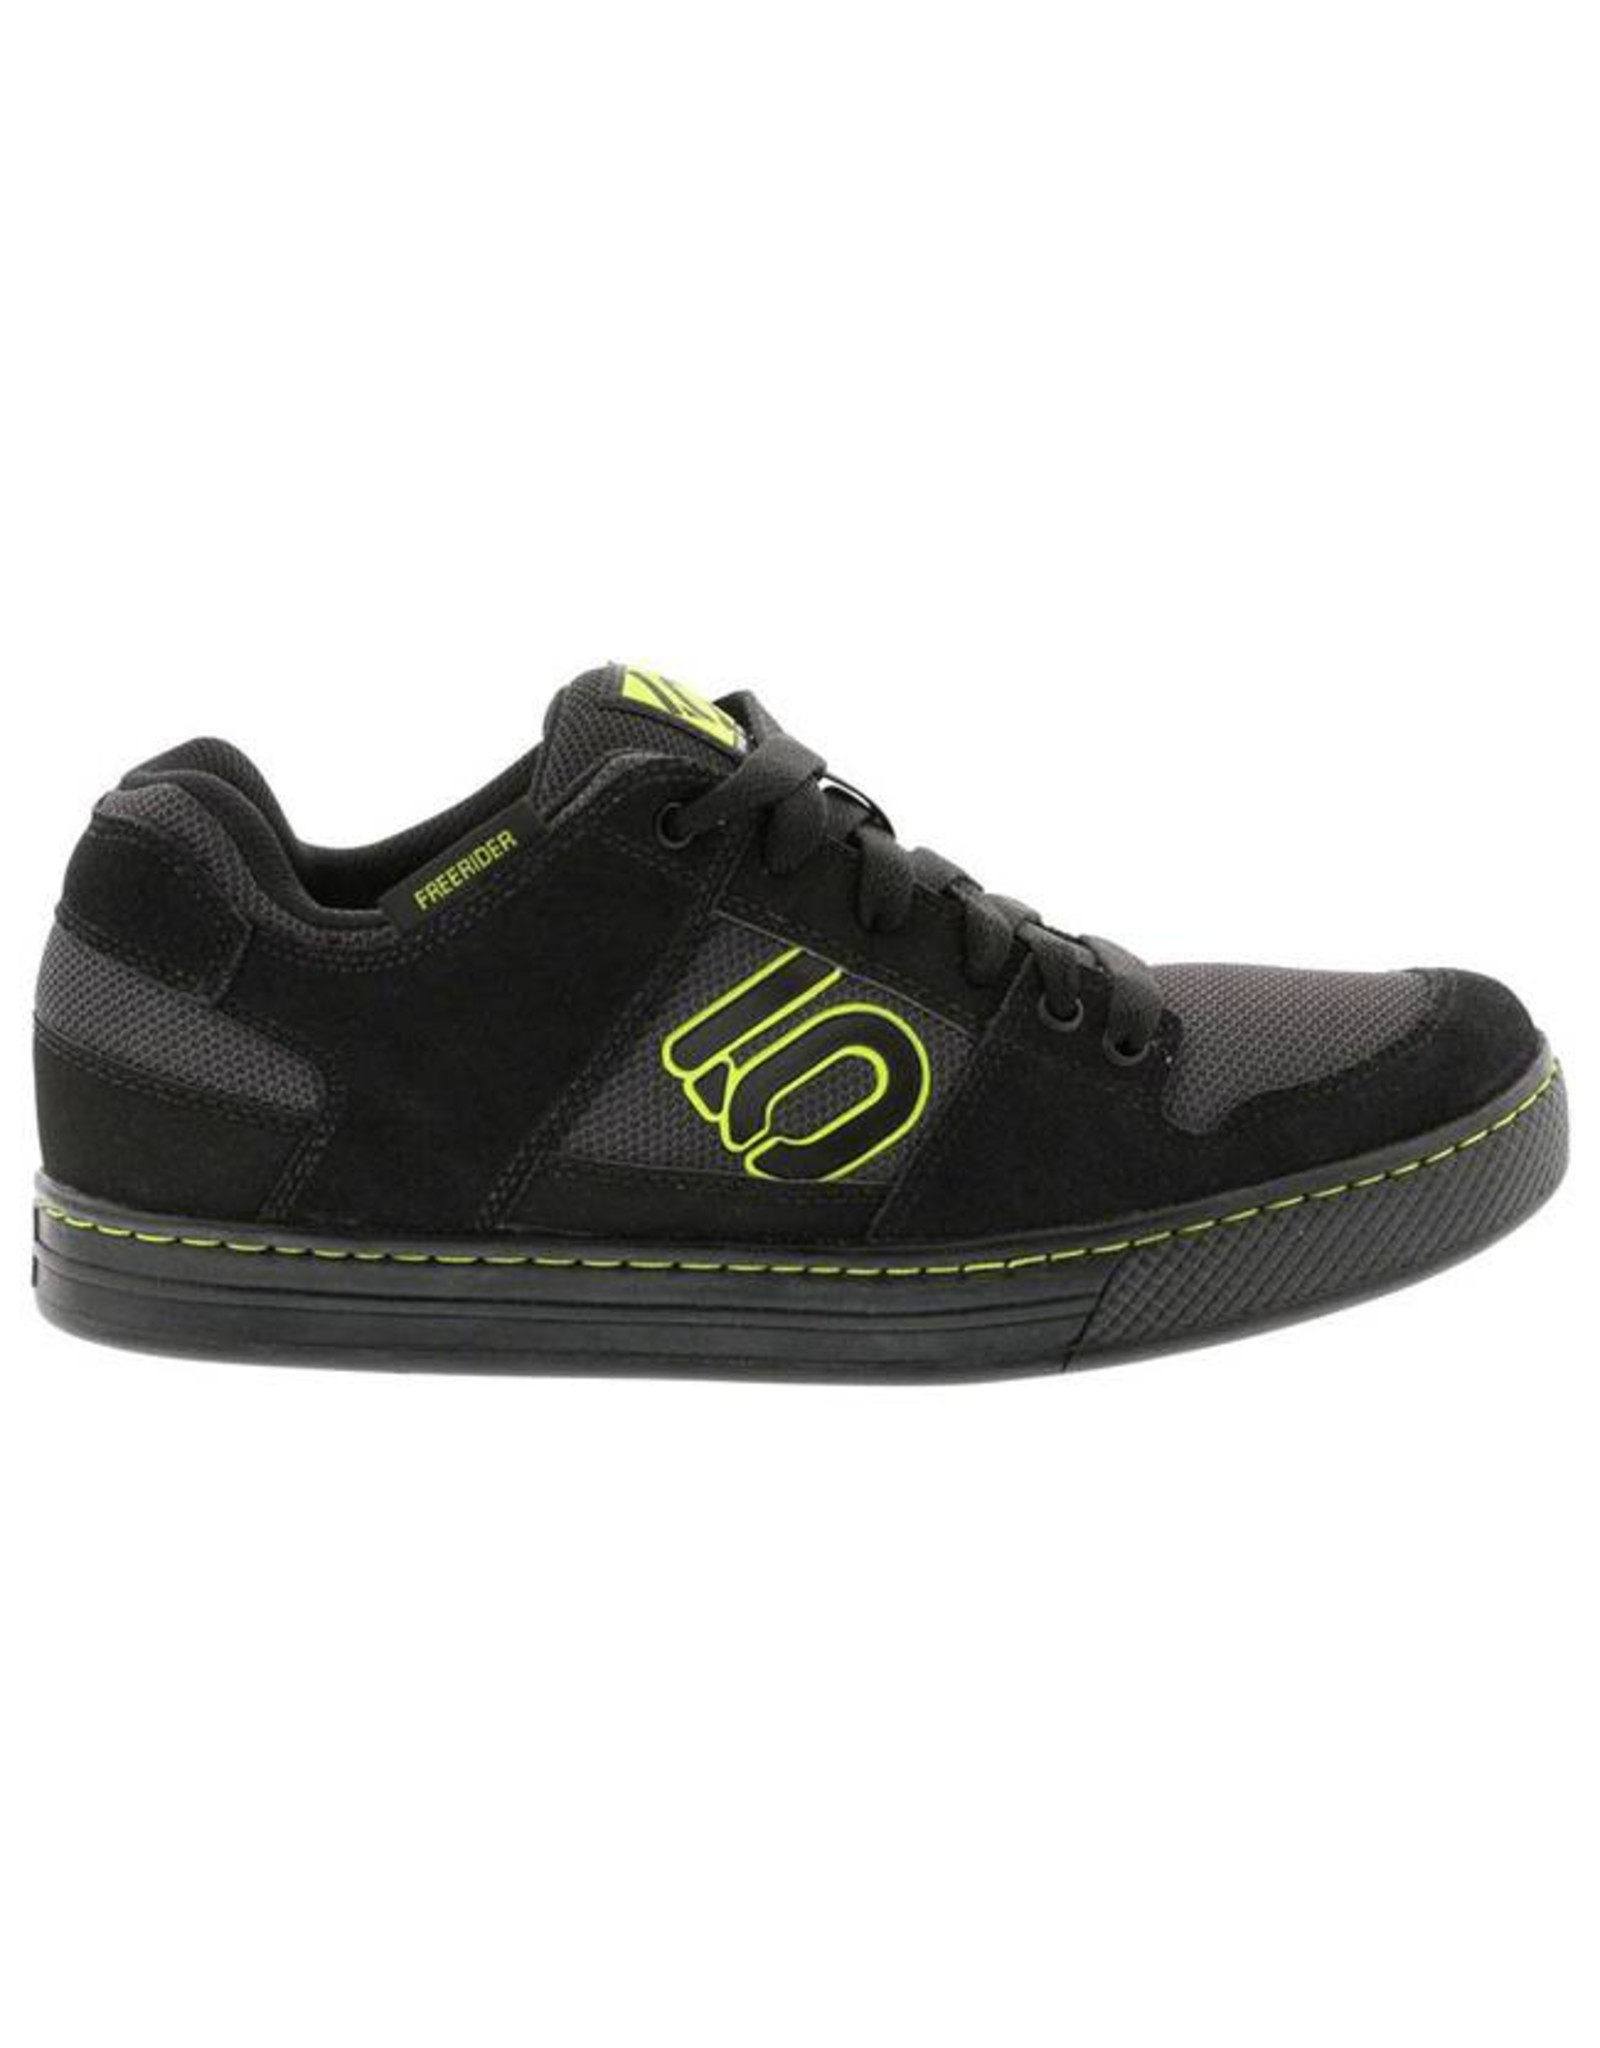 Five Ten Five Ten Freerider Men's Flat Pedal Shoe: Black Slime 10.5